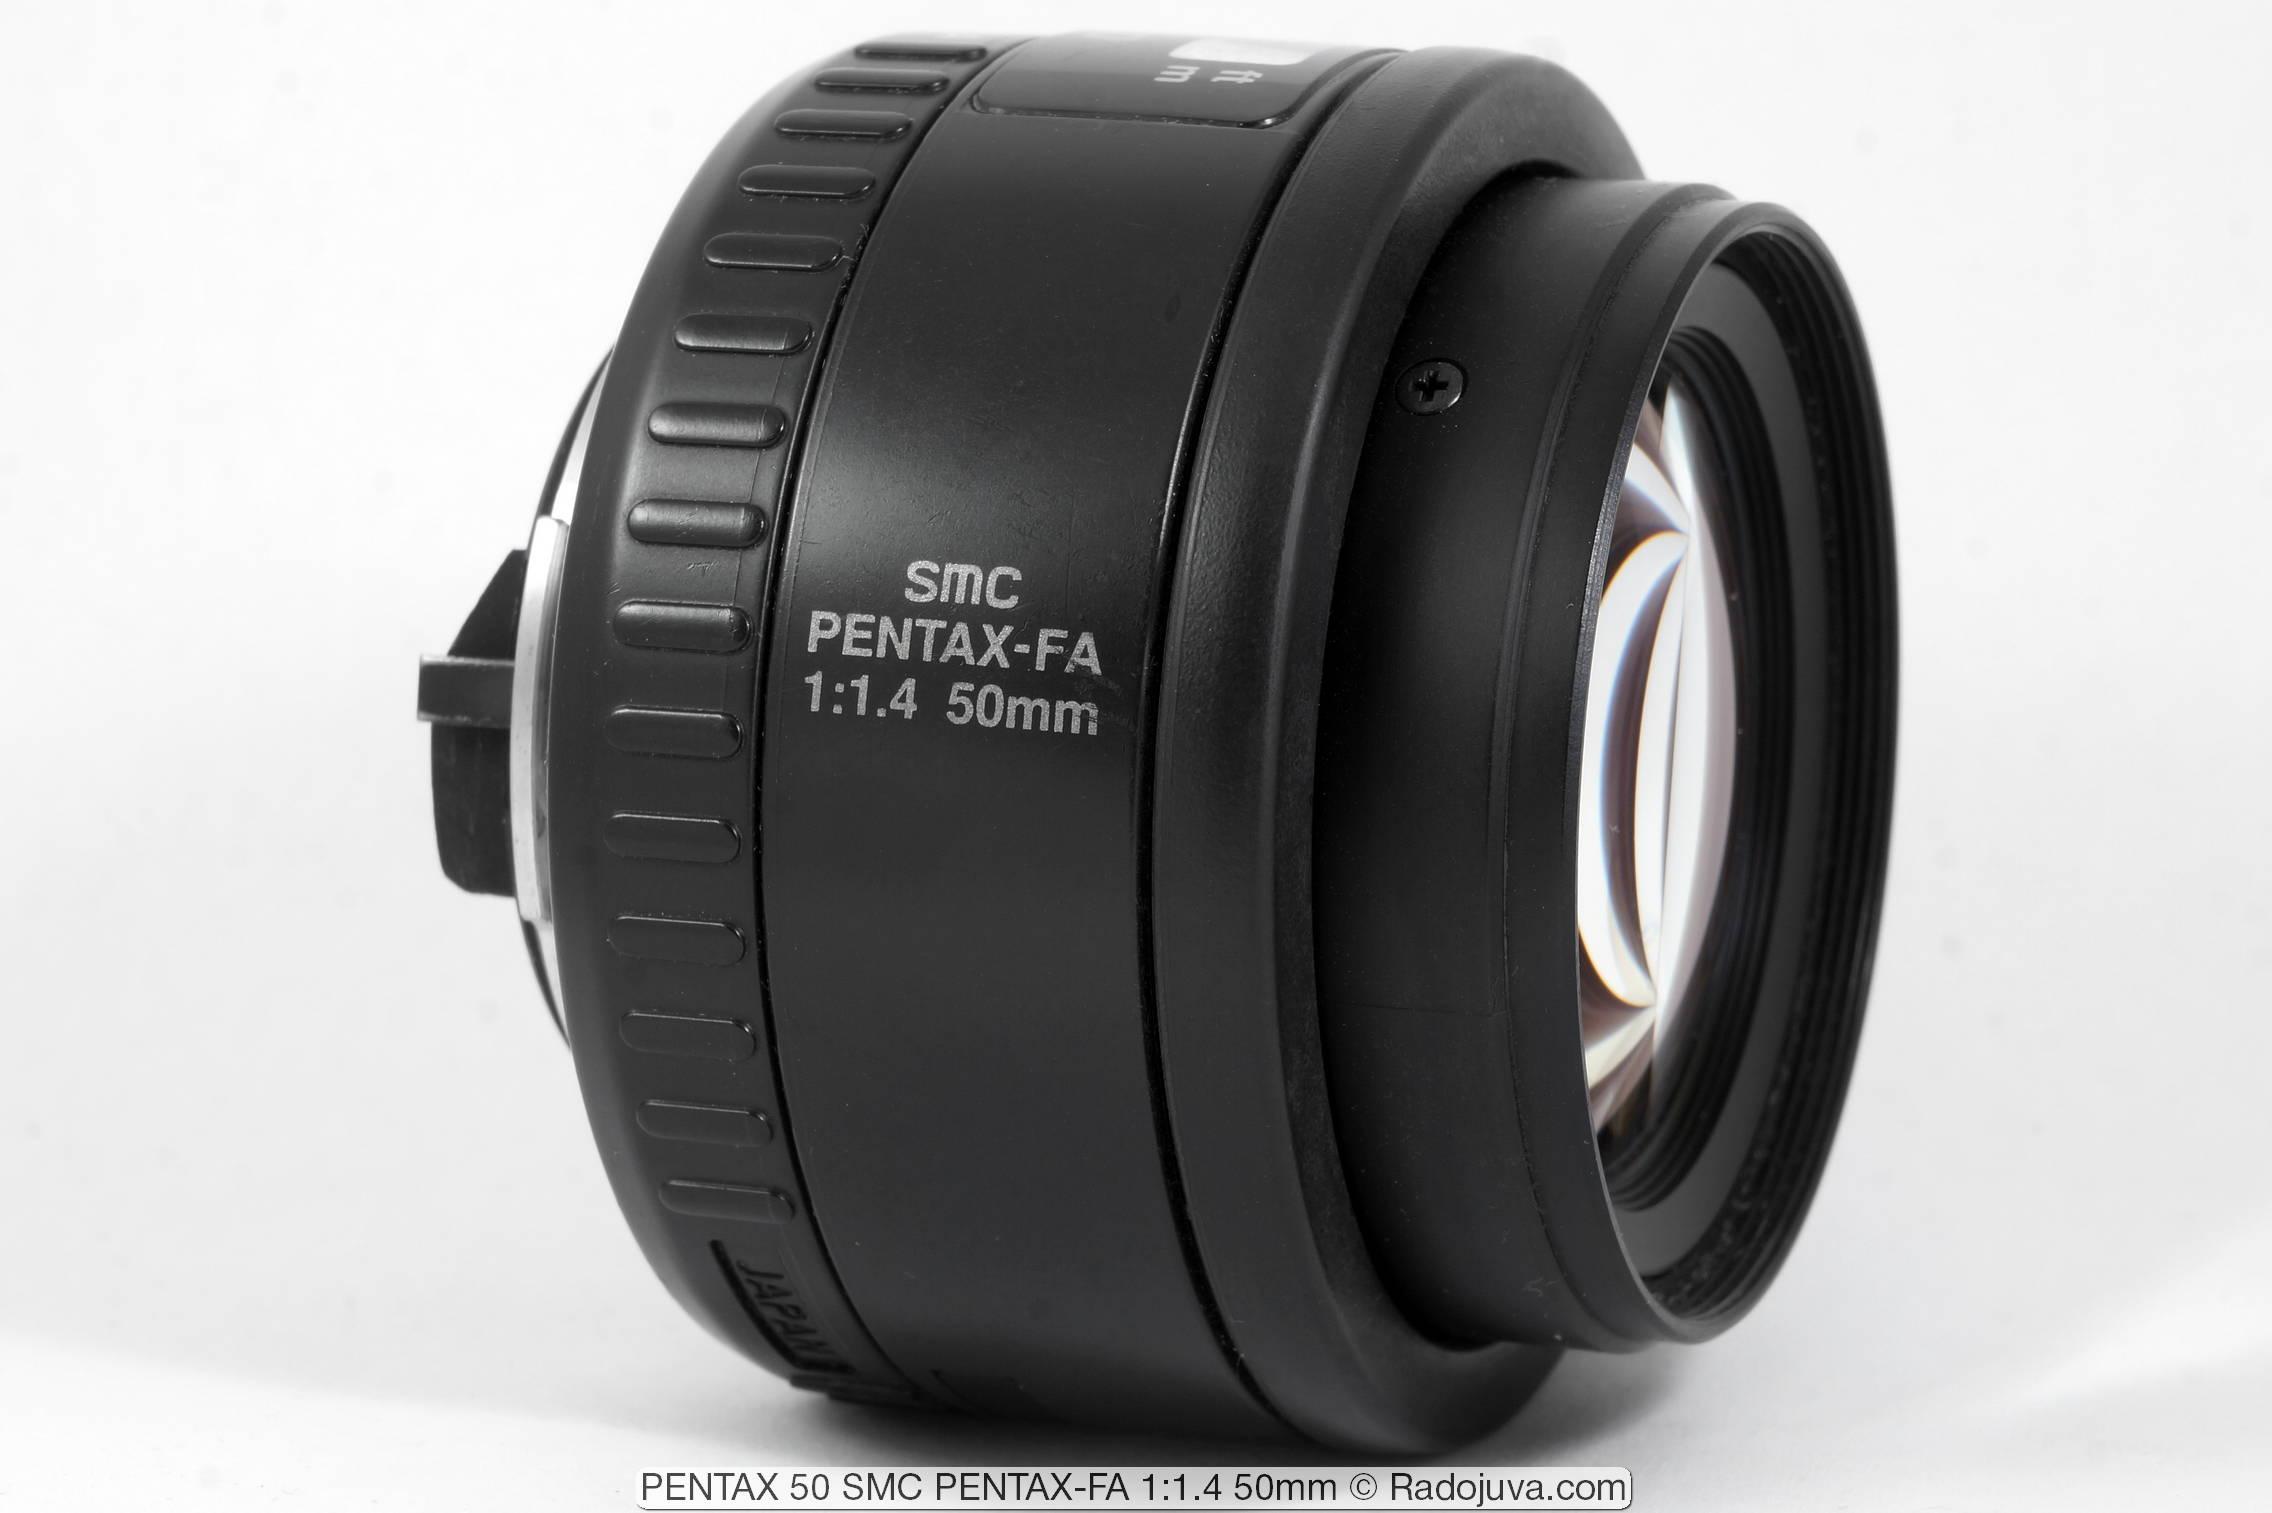 PENTAX 50 SMC PENTAX-FA 1:1.4 50mm